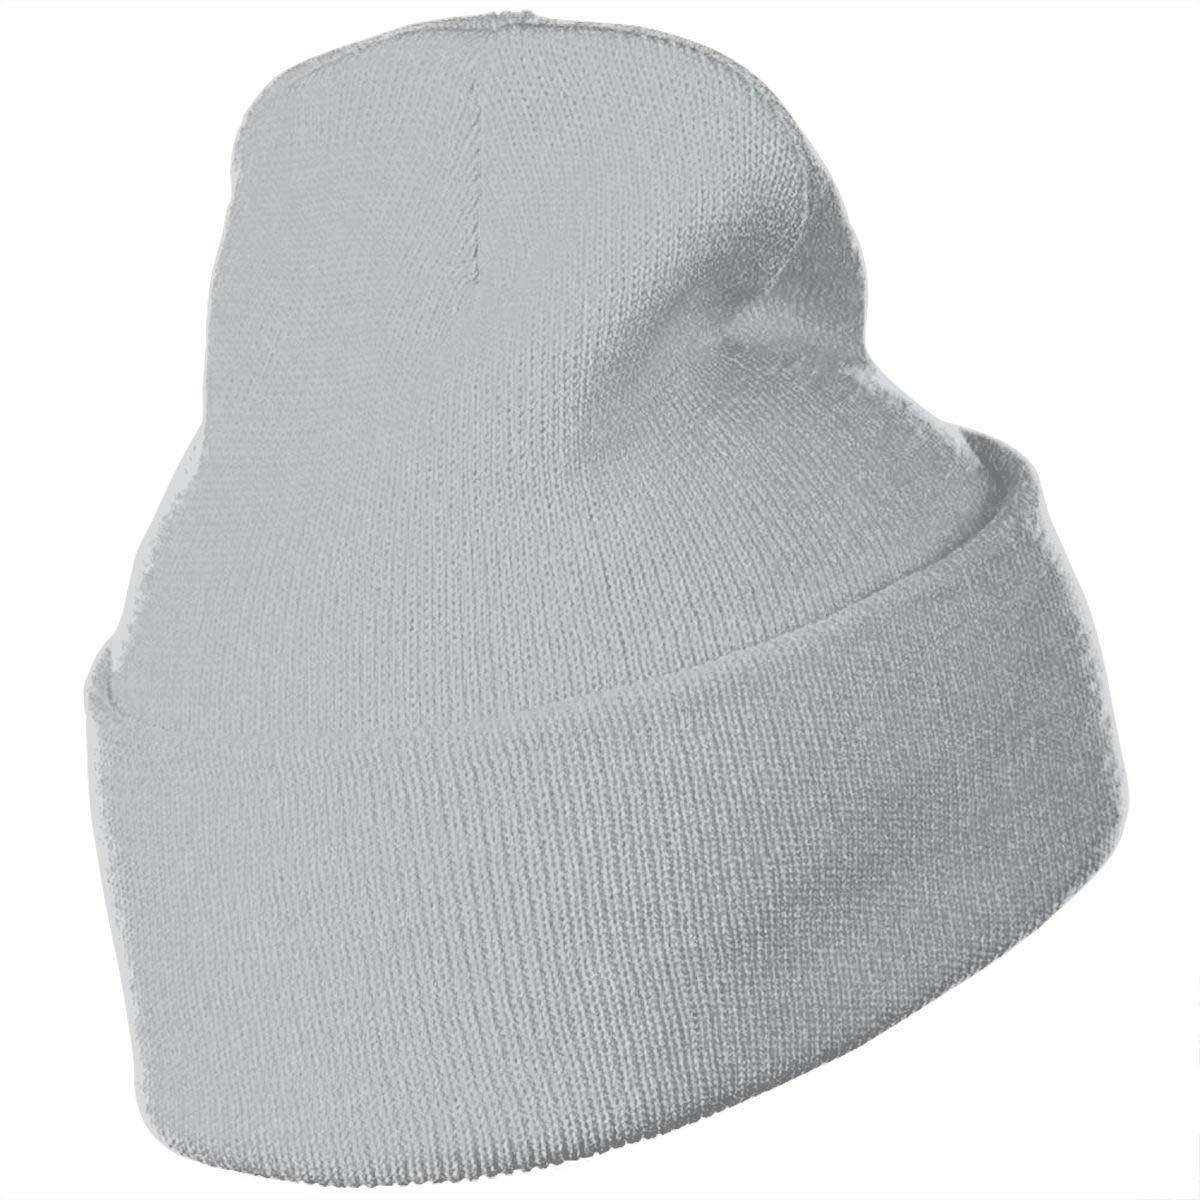 Purple Leaf Warm Knit Winter Solid Beanie Hat Unisex Skull Cap